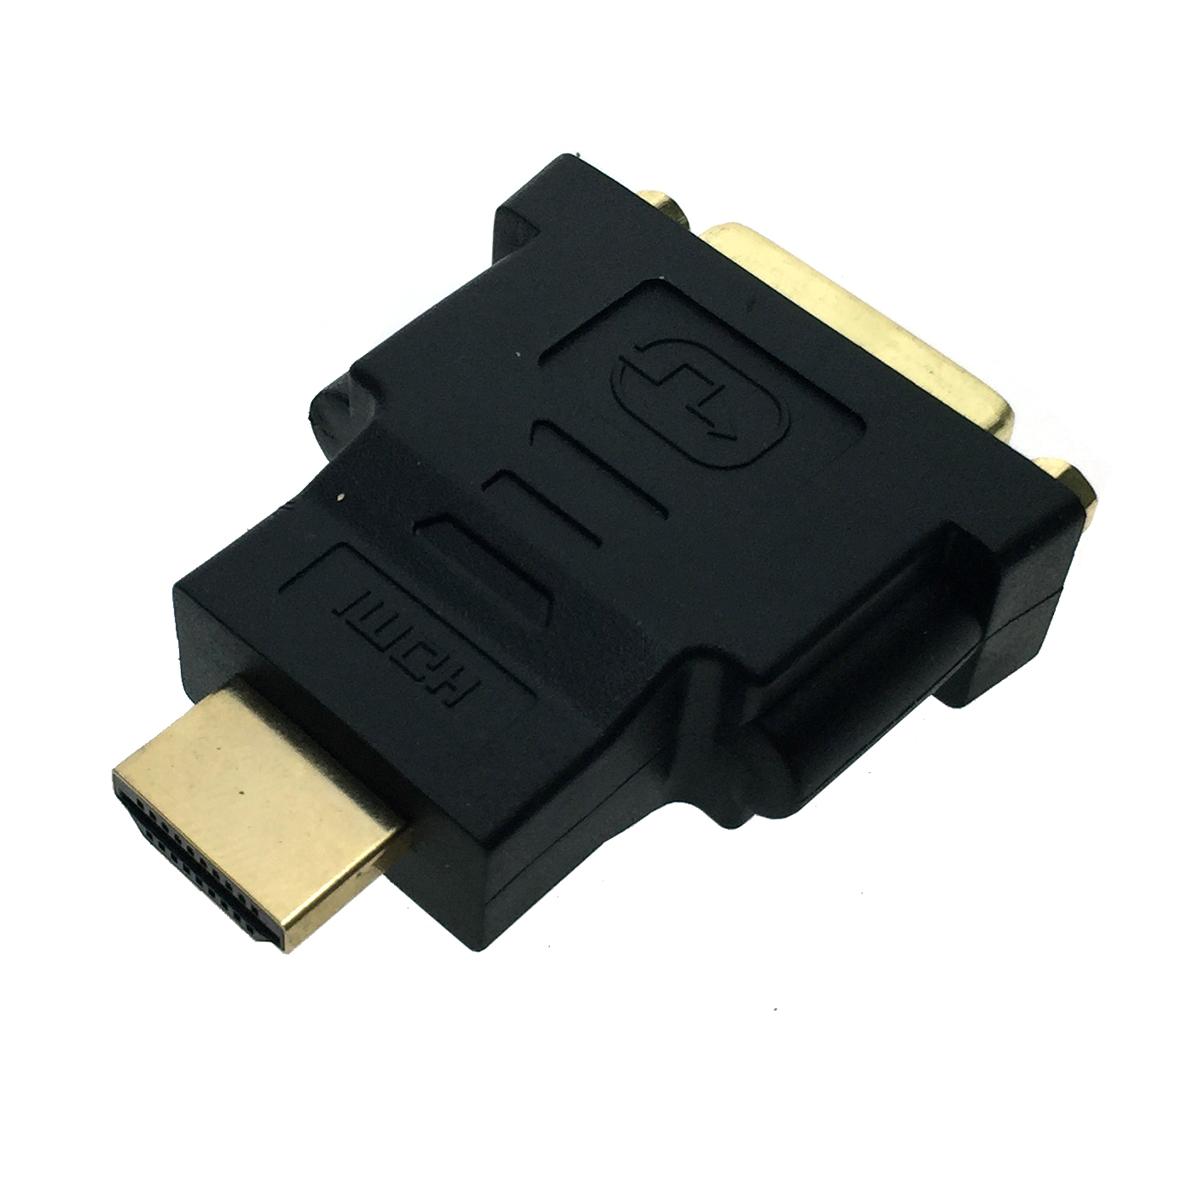 Переходник HDMI 19pin male to DVI-I 29pin female, Espada EHDMI19m-DVI29f